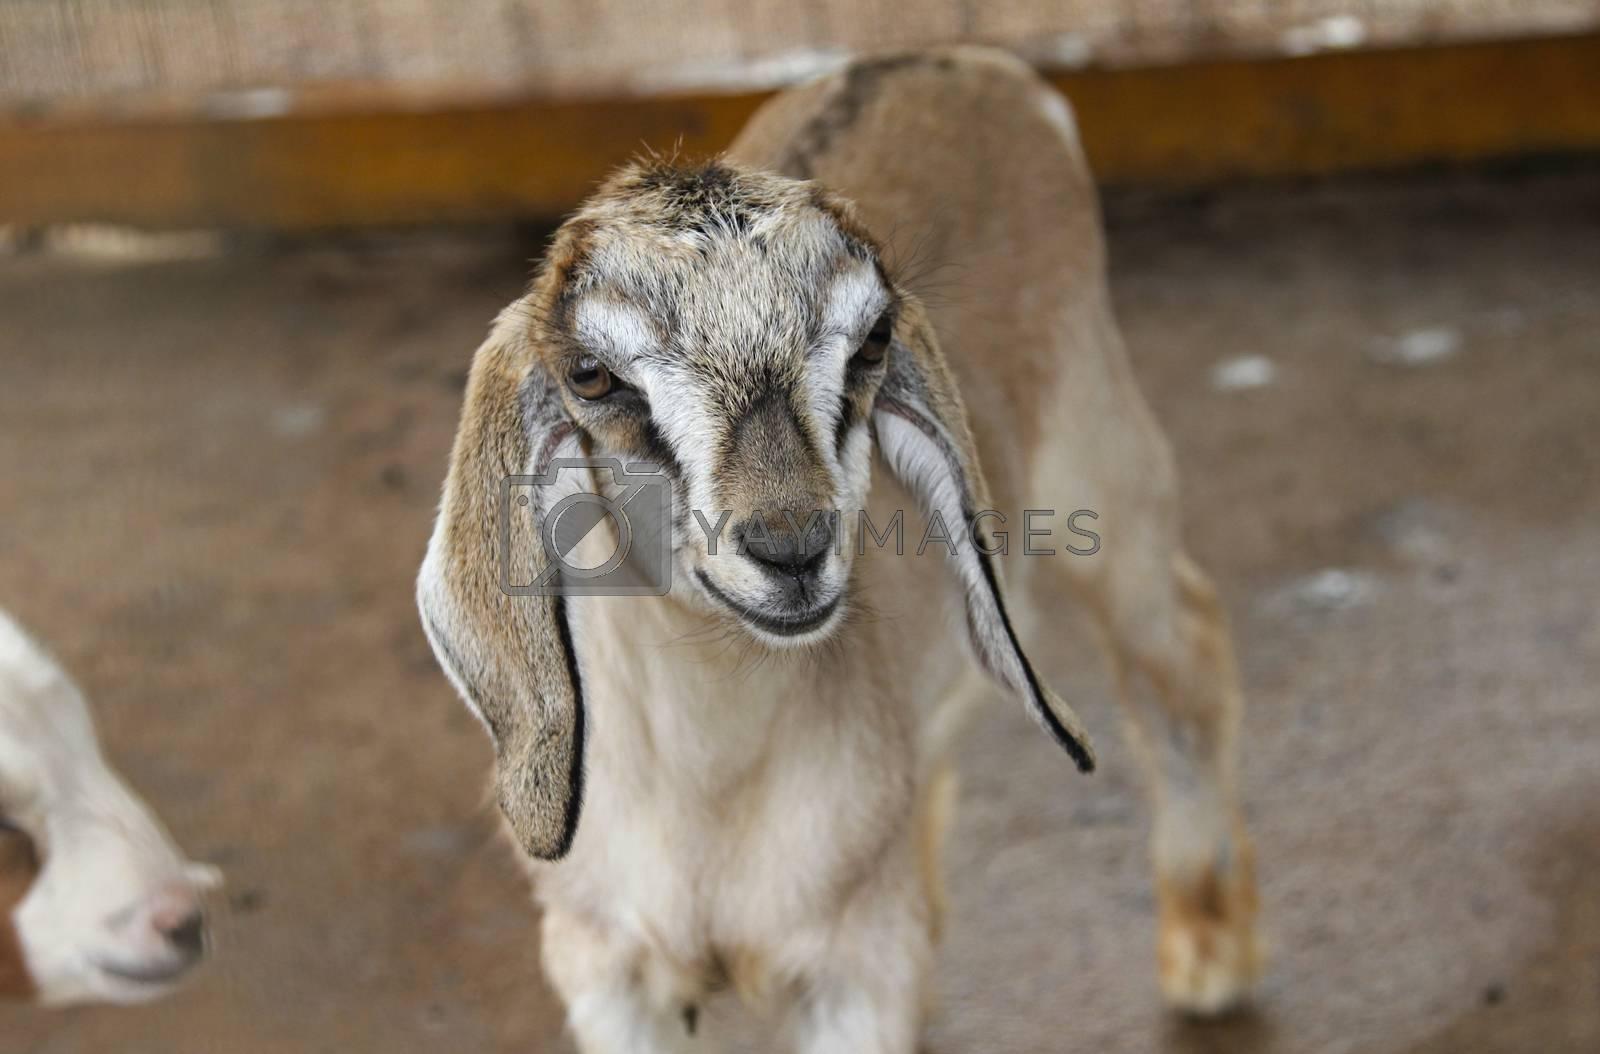 A baby goat lamb animal